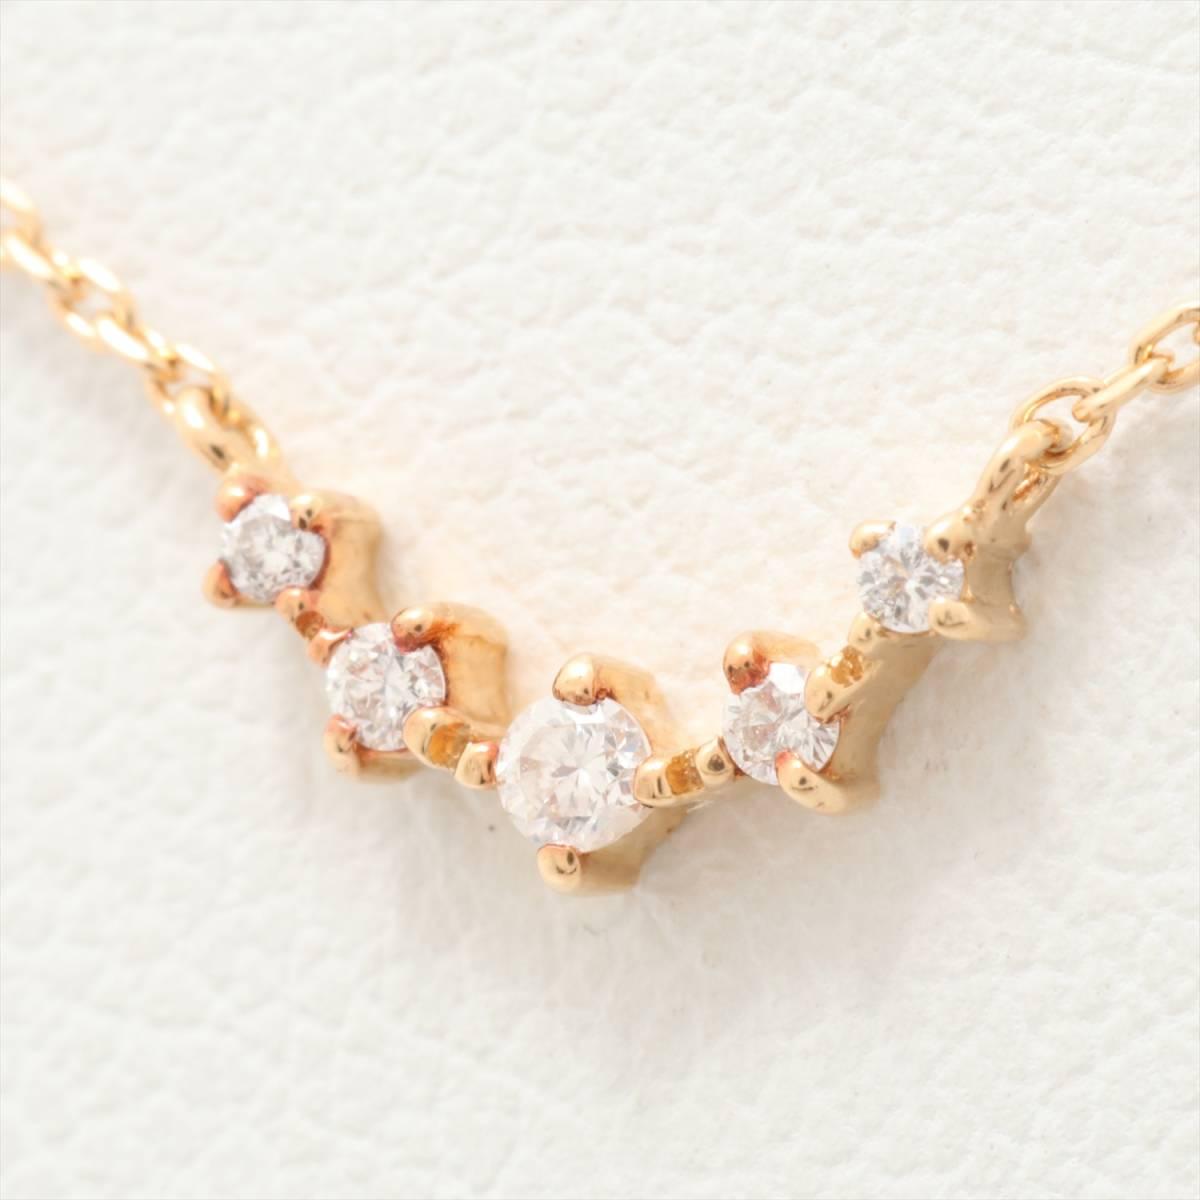 ff6bc6cd71 ヴァンドーム青山 ダイヤモンド ネックレス K18YG 華奢 星 ライン シンプル VENDOMEの1番目 ...